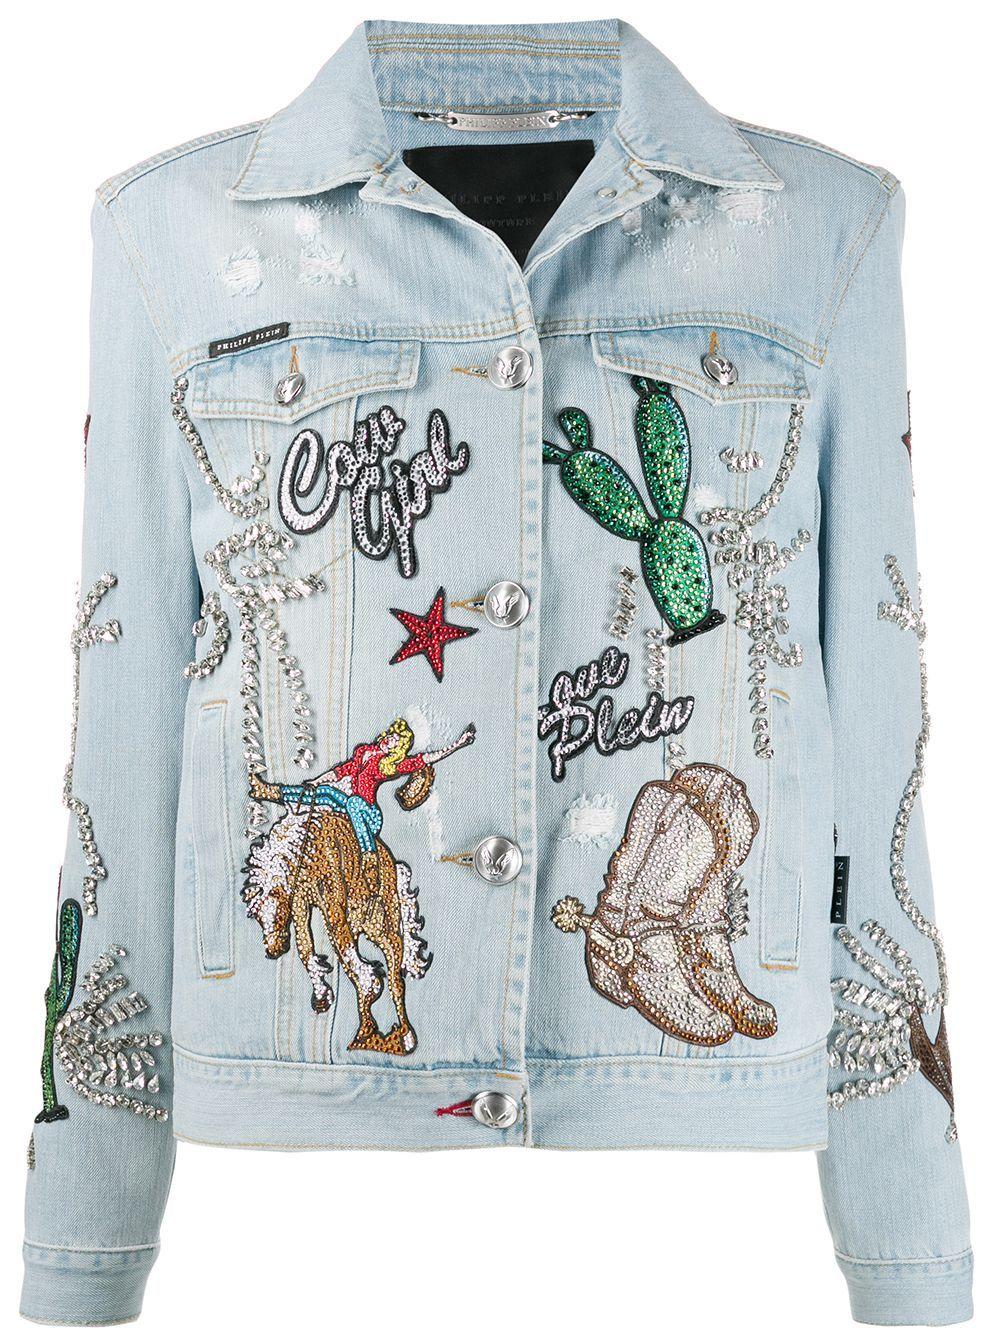 Philipp Plein Cowboy Denim Jacket Farfetch In 2021 Denim Jacket Embroidery Diy Denim Jacket Denim Jacket [ 1334 x 1000 Pixel ]